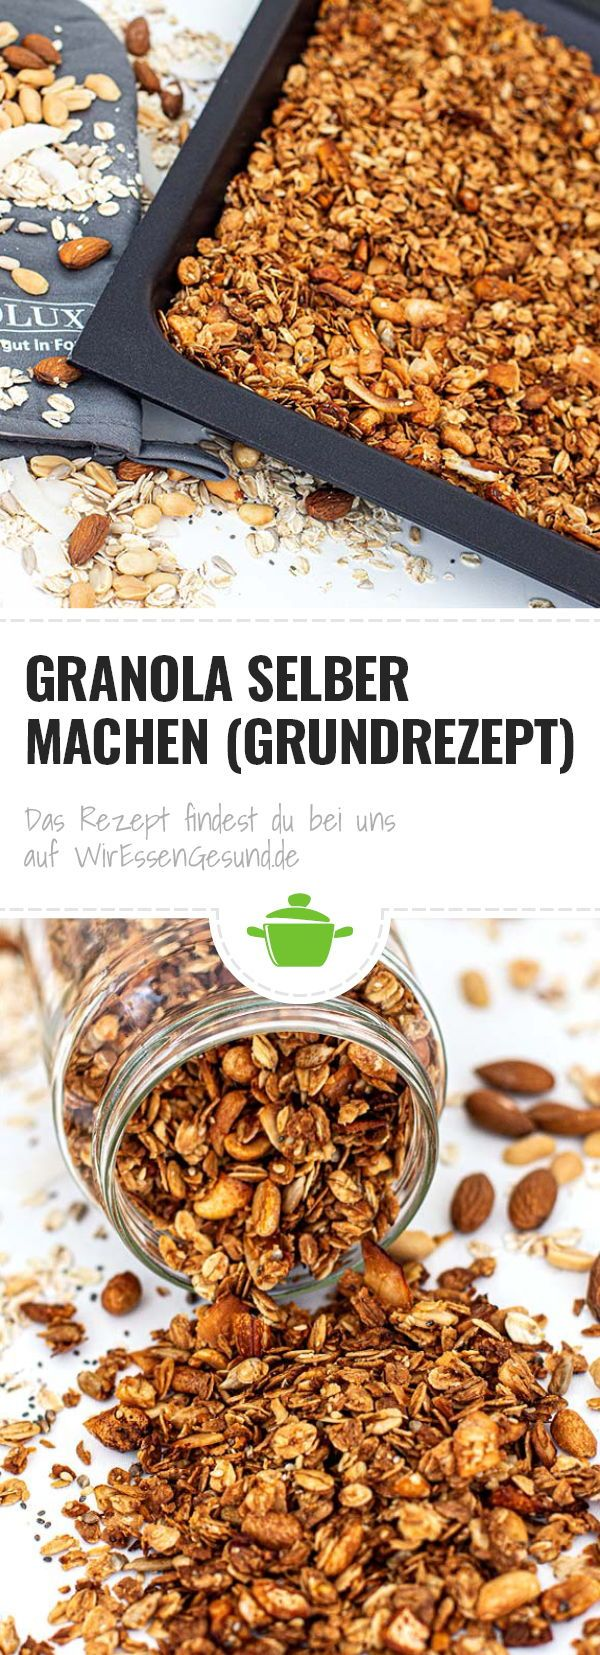 Granola selber machen (Grundrezept) #foodsanddesserts